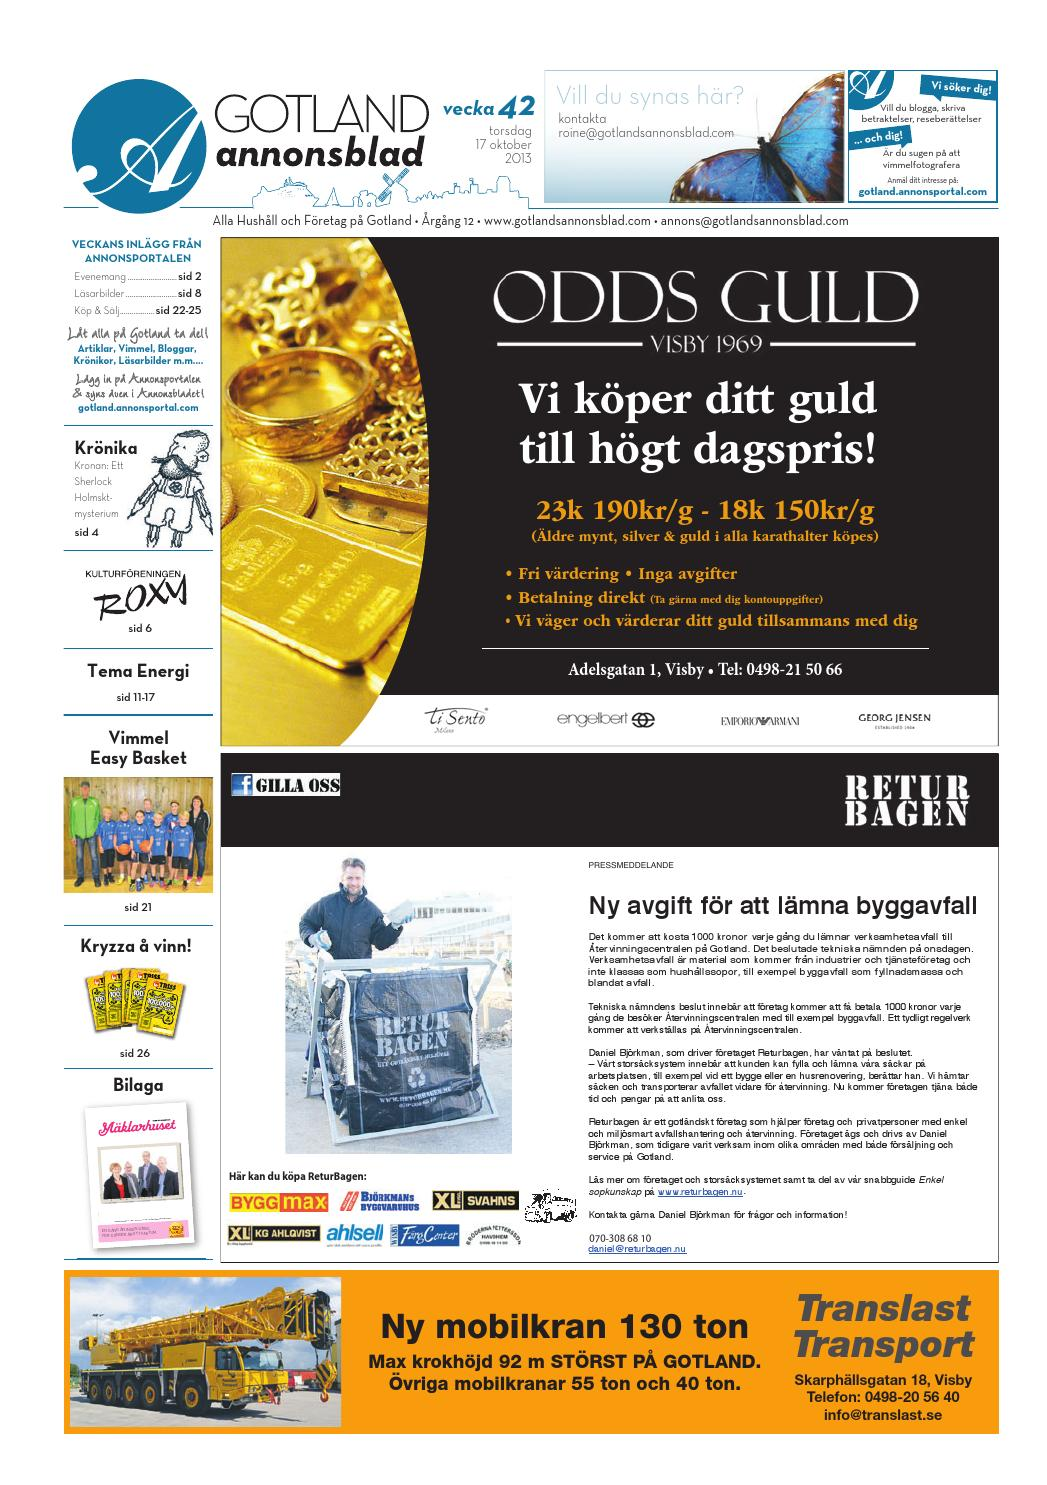 Goab 2013 vecka42 by Svenska Civildatalogerna AB - issuu b1a99947a5e4b